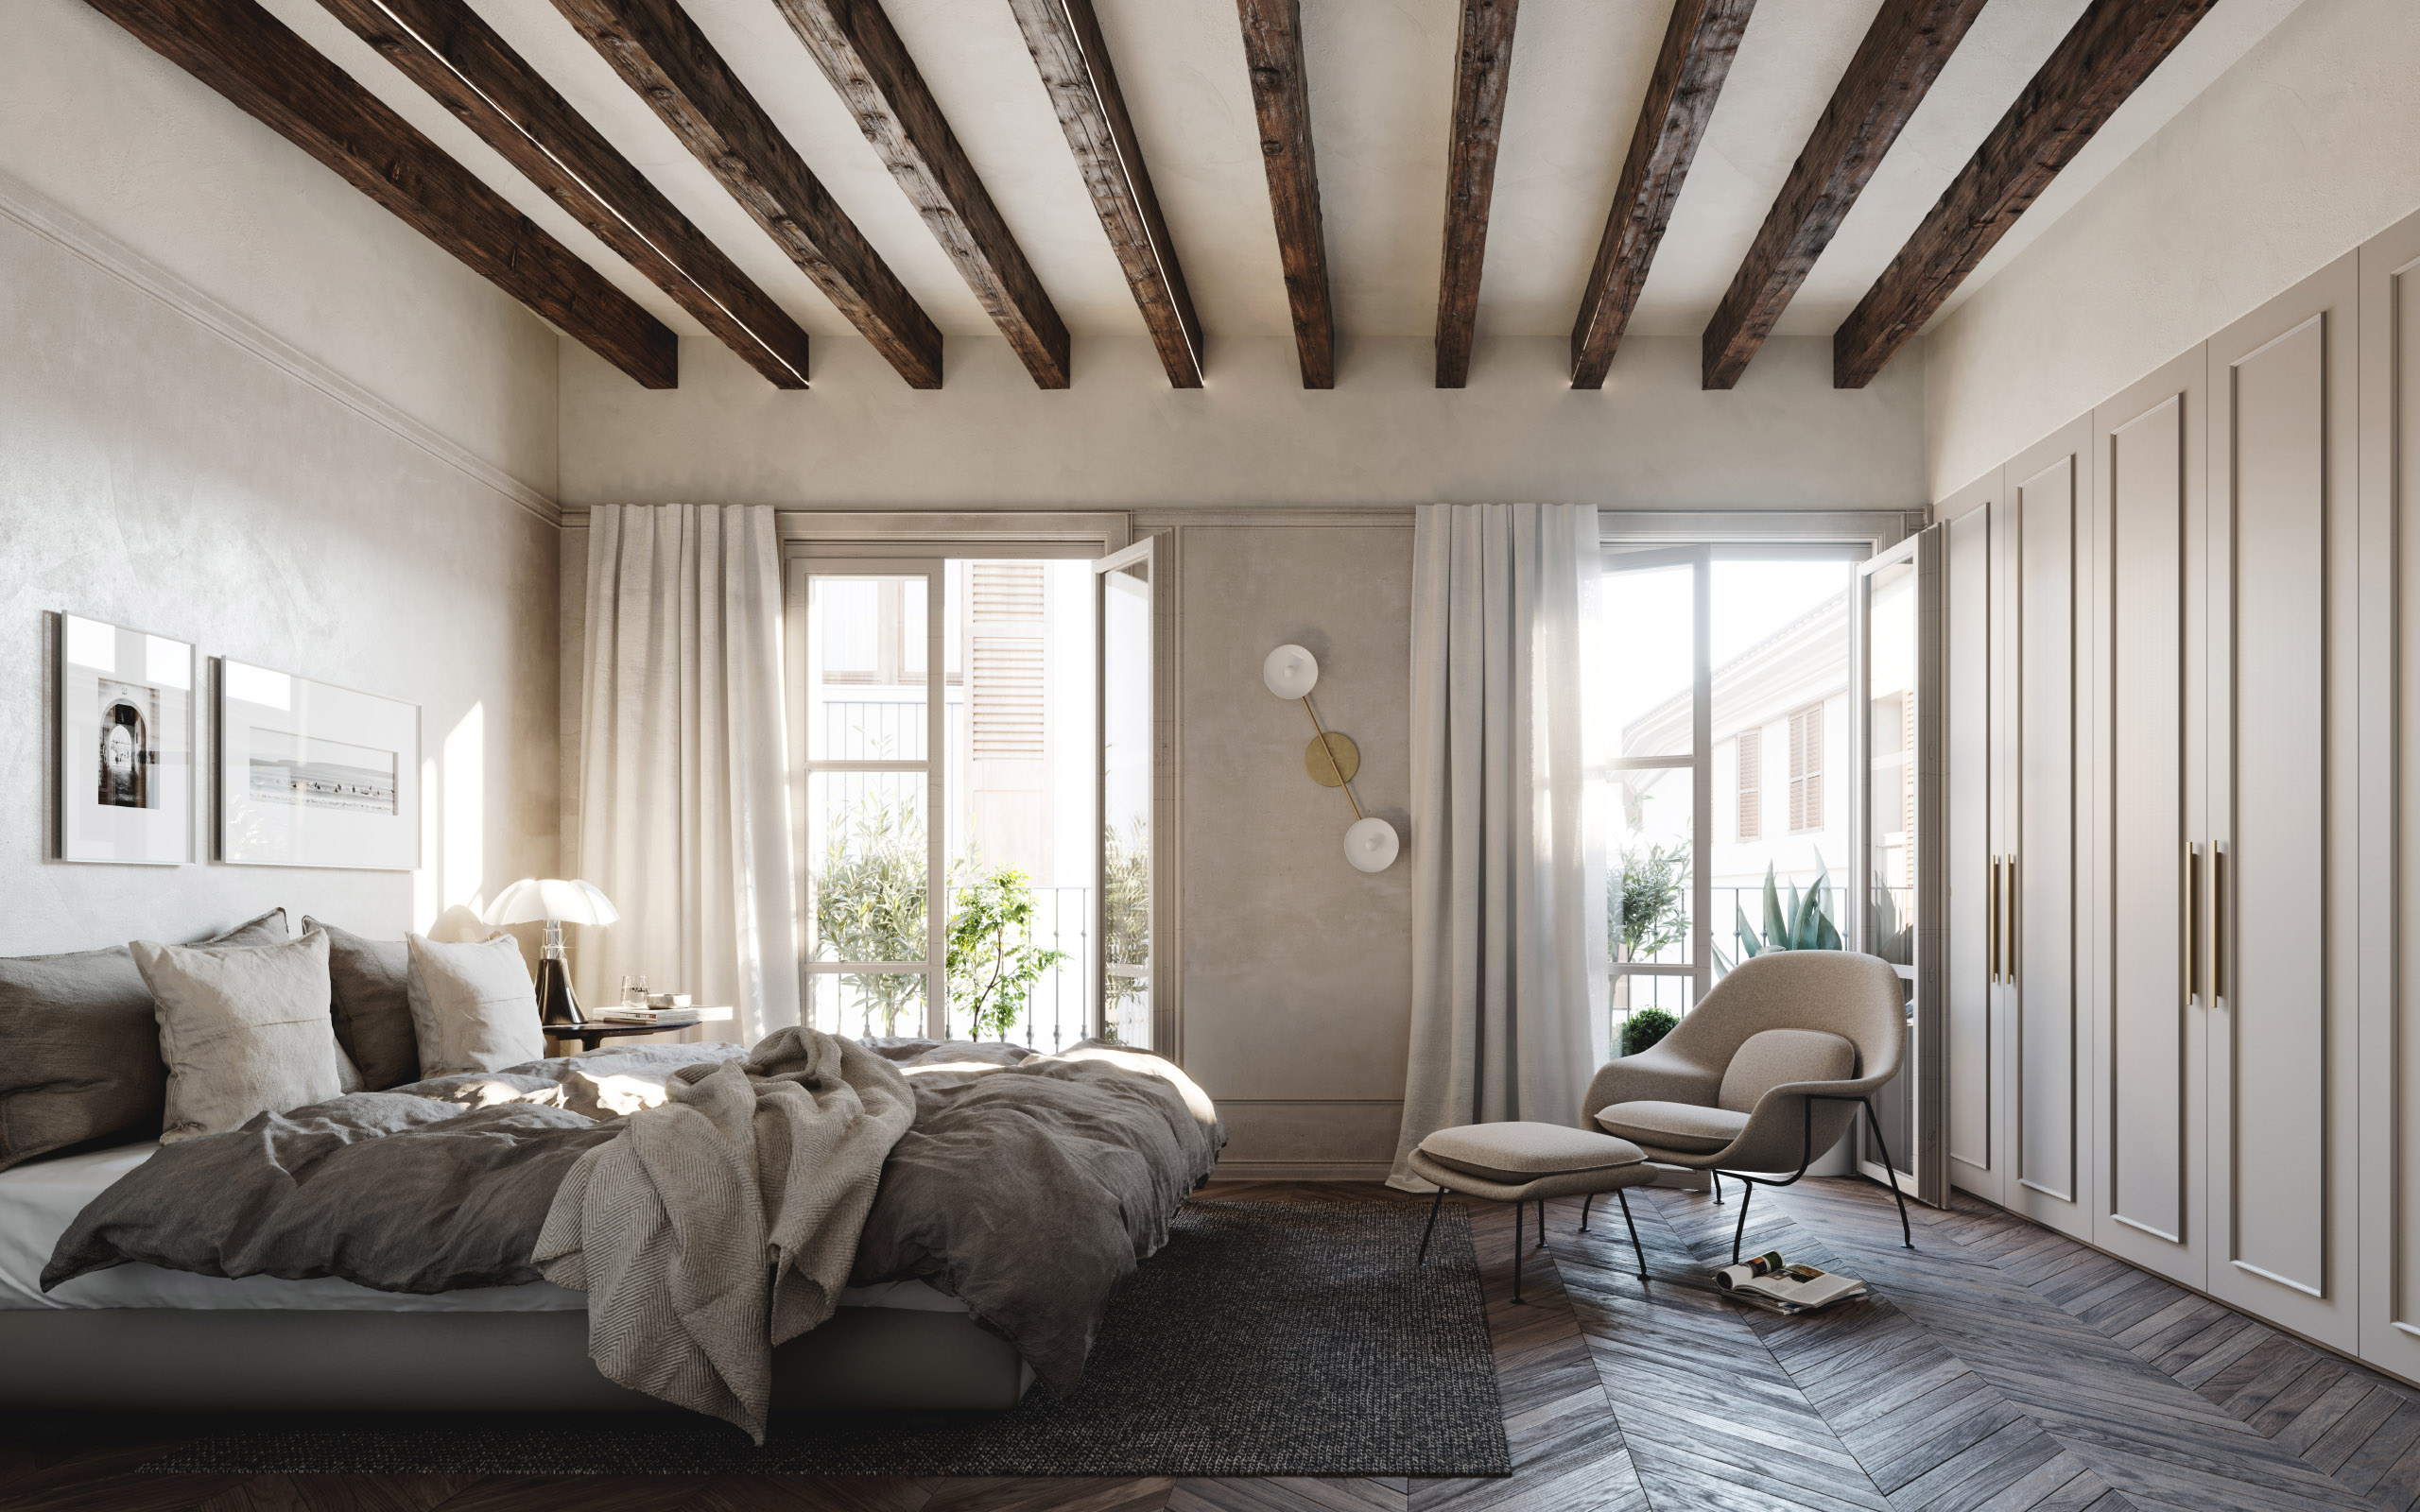 Bedroom_2560px_Jpeg9